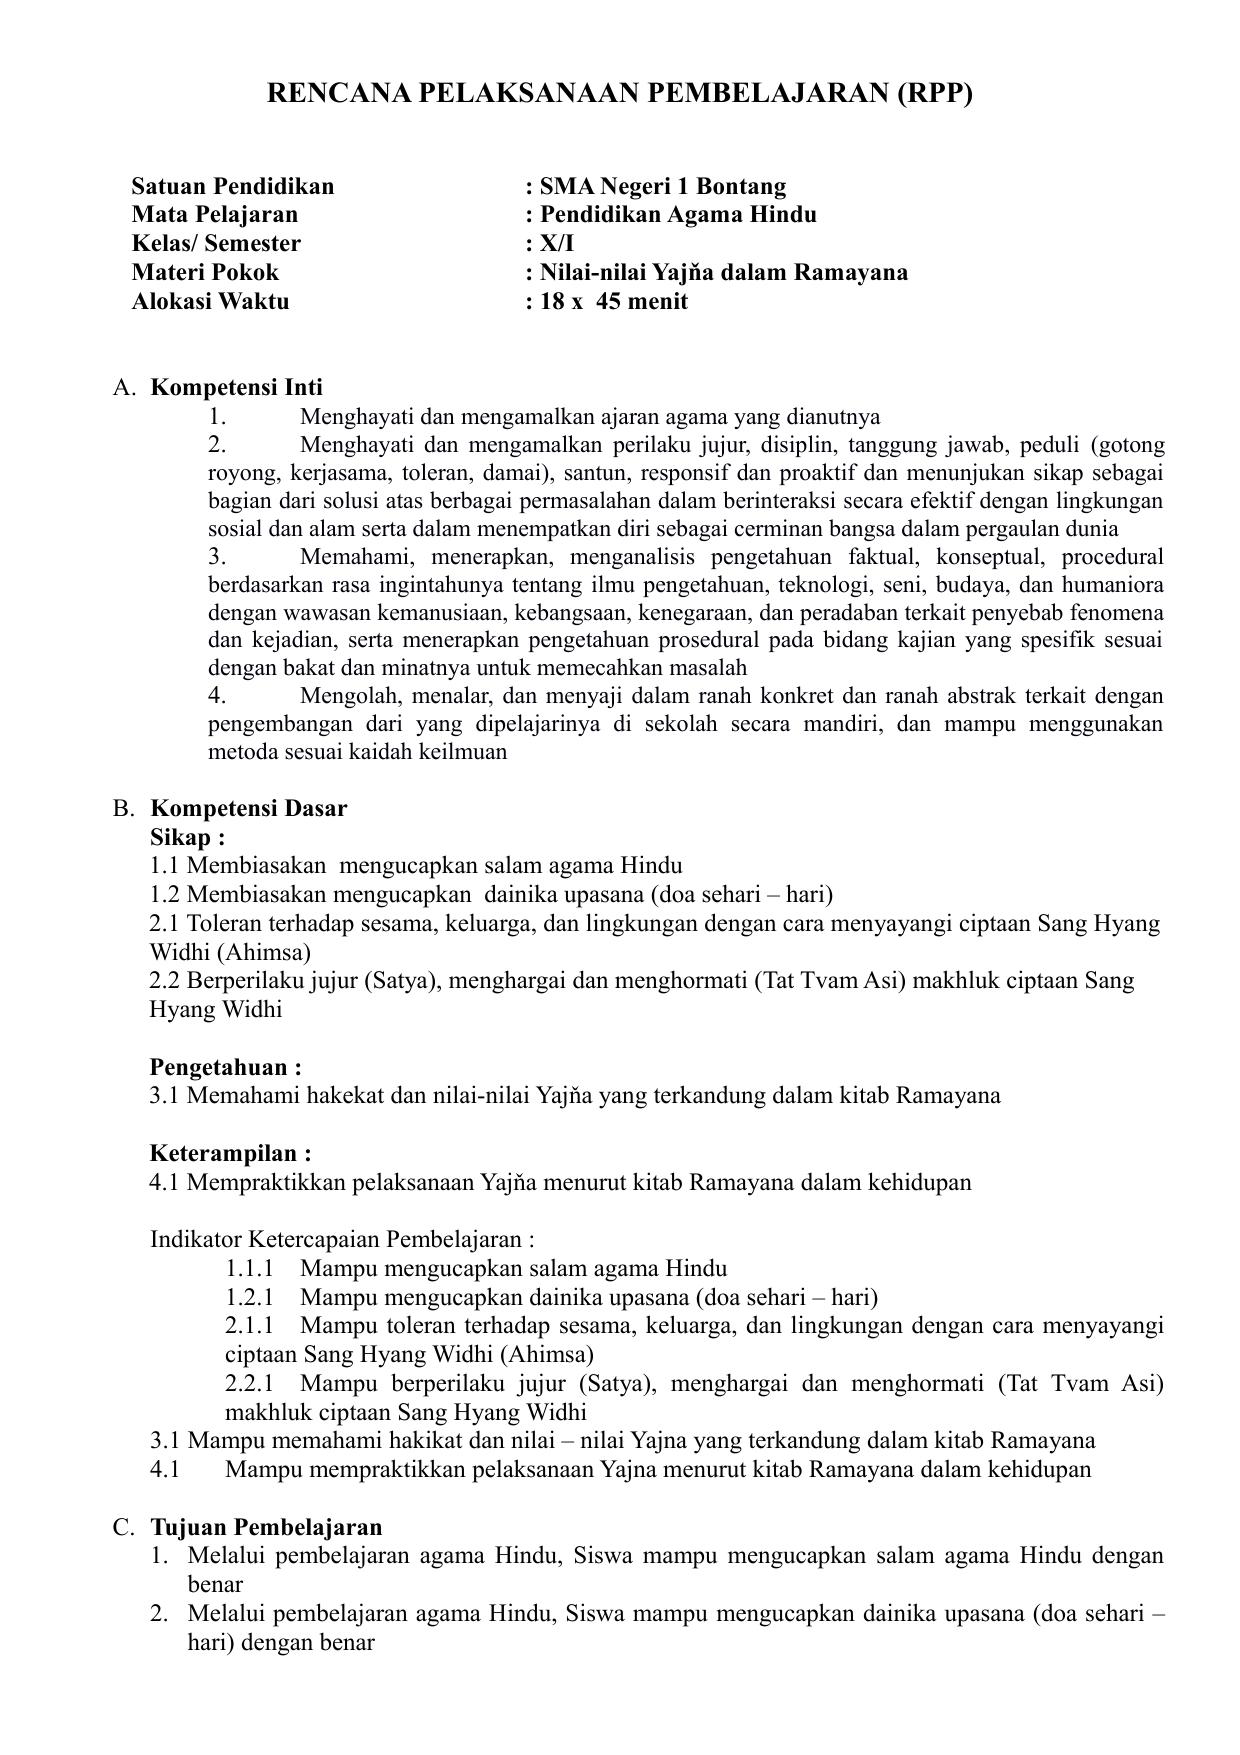 Rencana Pelaksanaan Pembelajaran Rpp